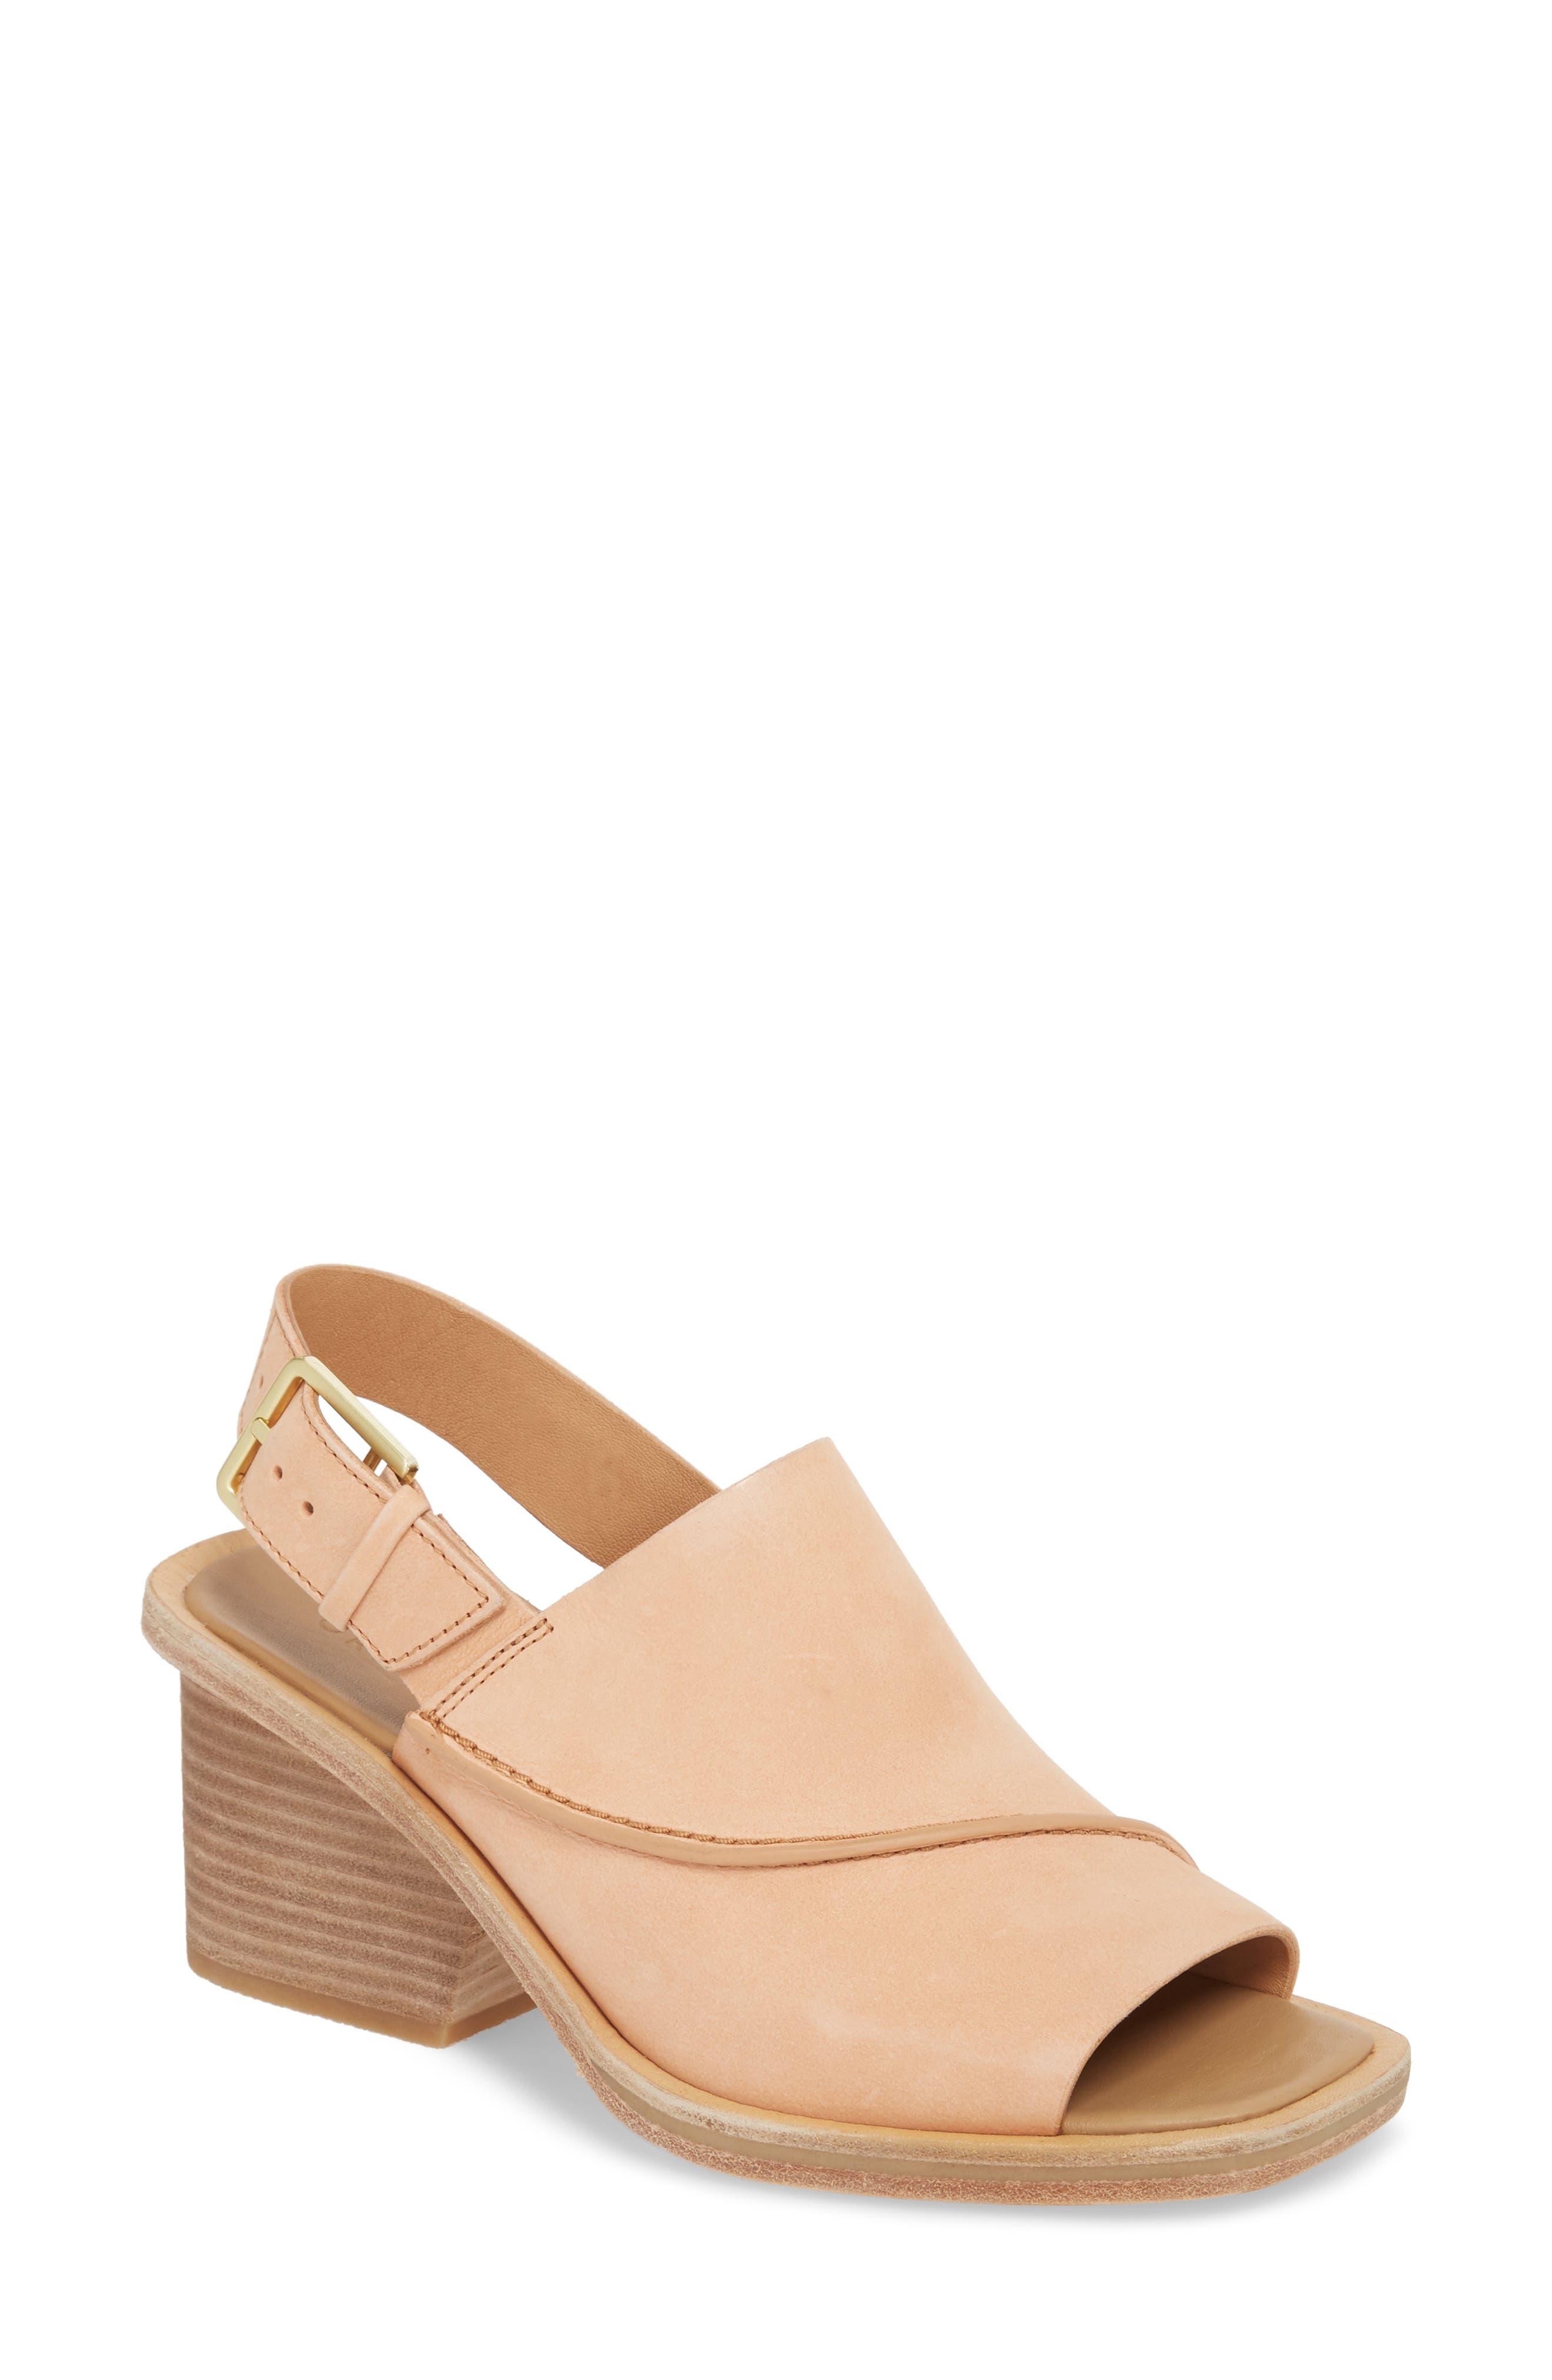 Clarks Bermudan Block Heel Sandal,                             Main thumbnail 1, color,                             Sandstone Nubuck Leather